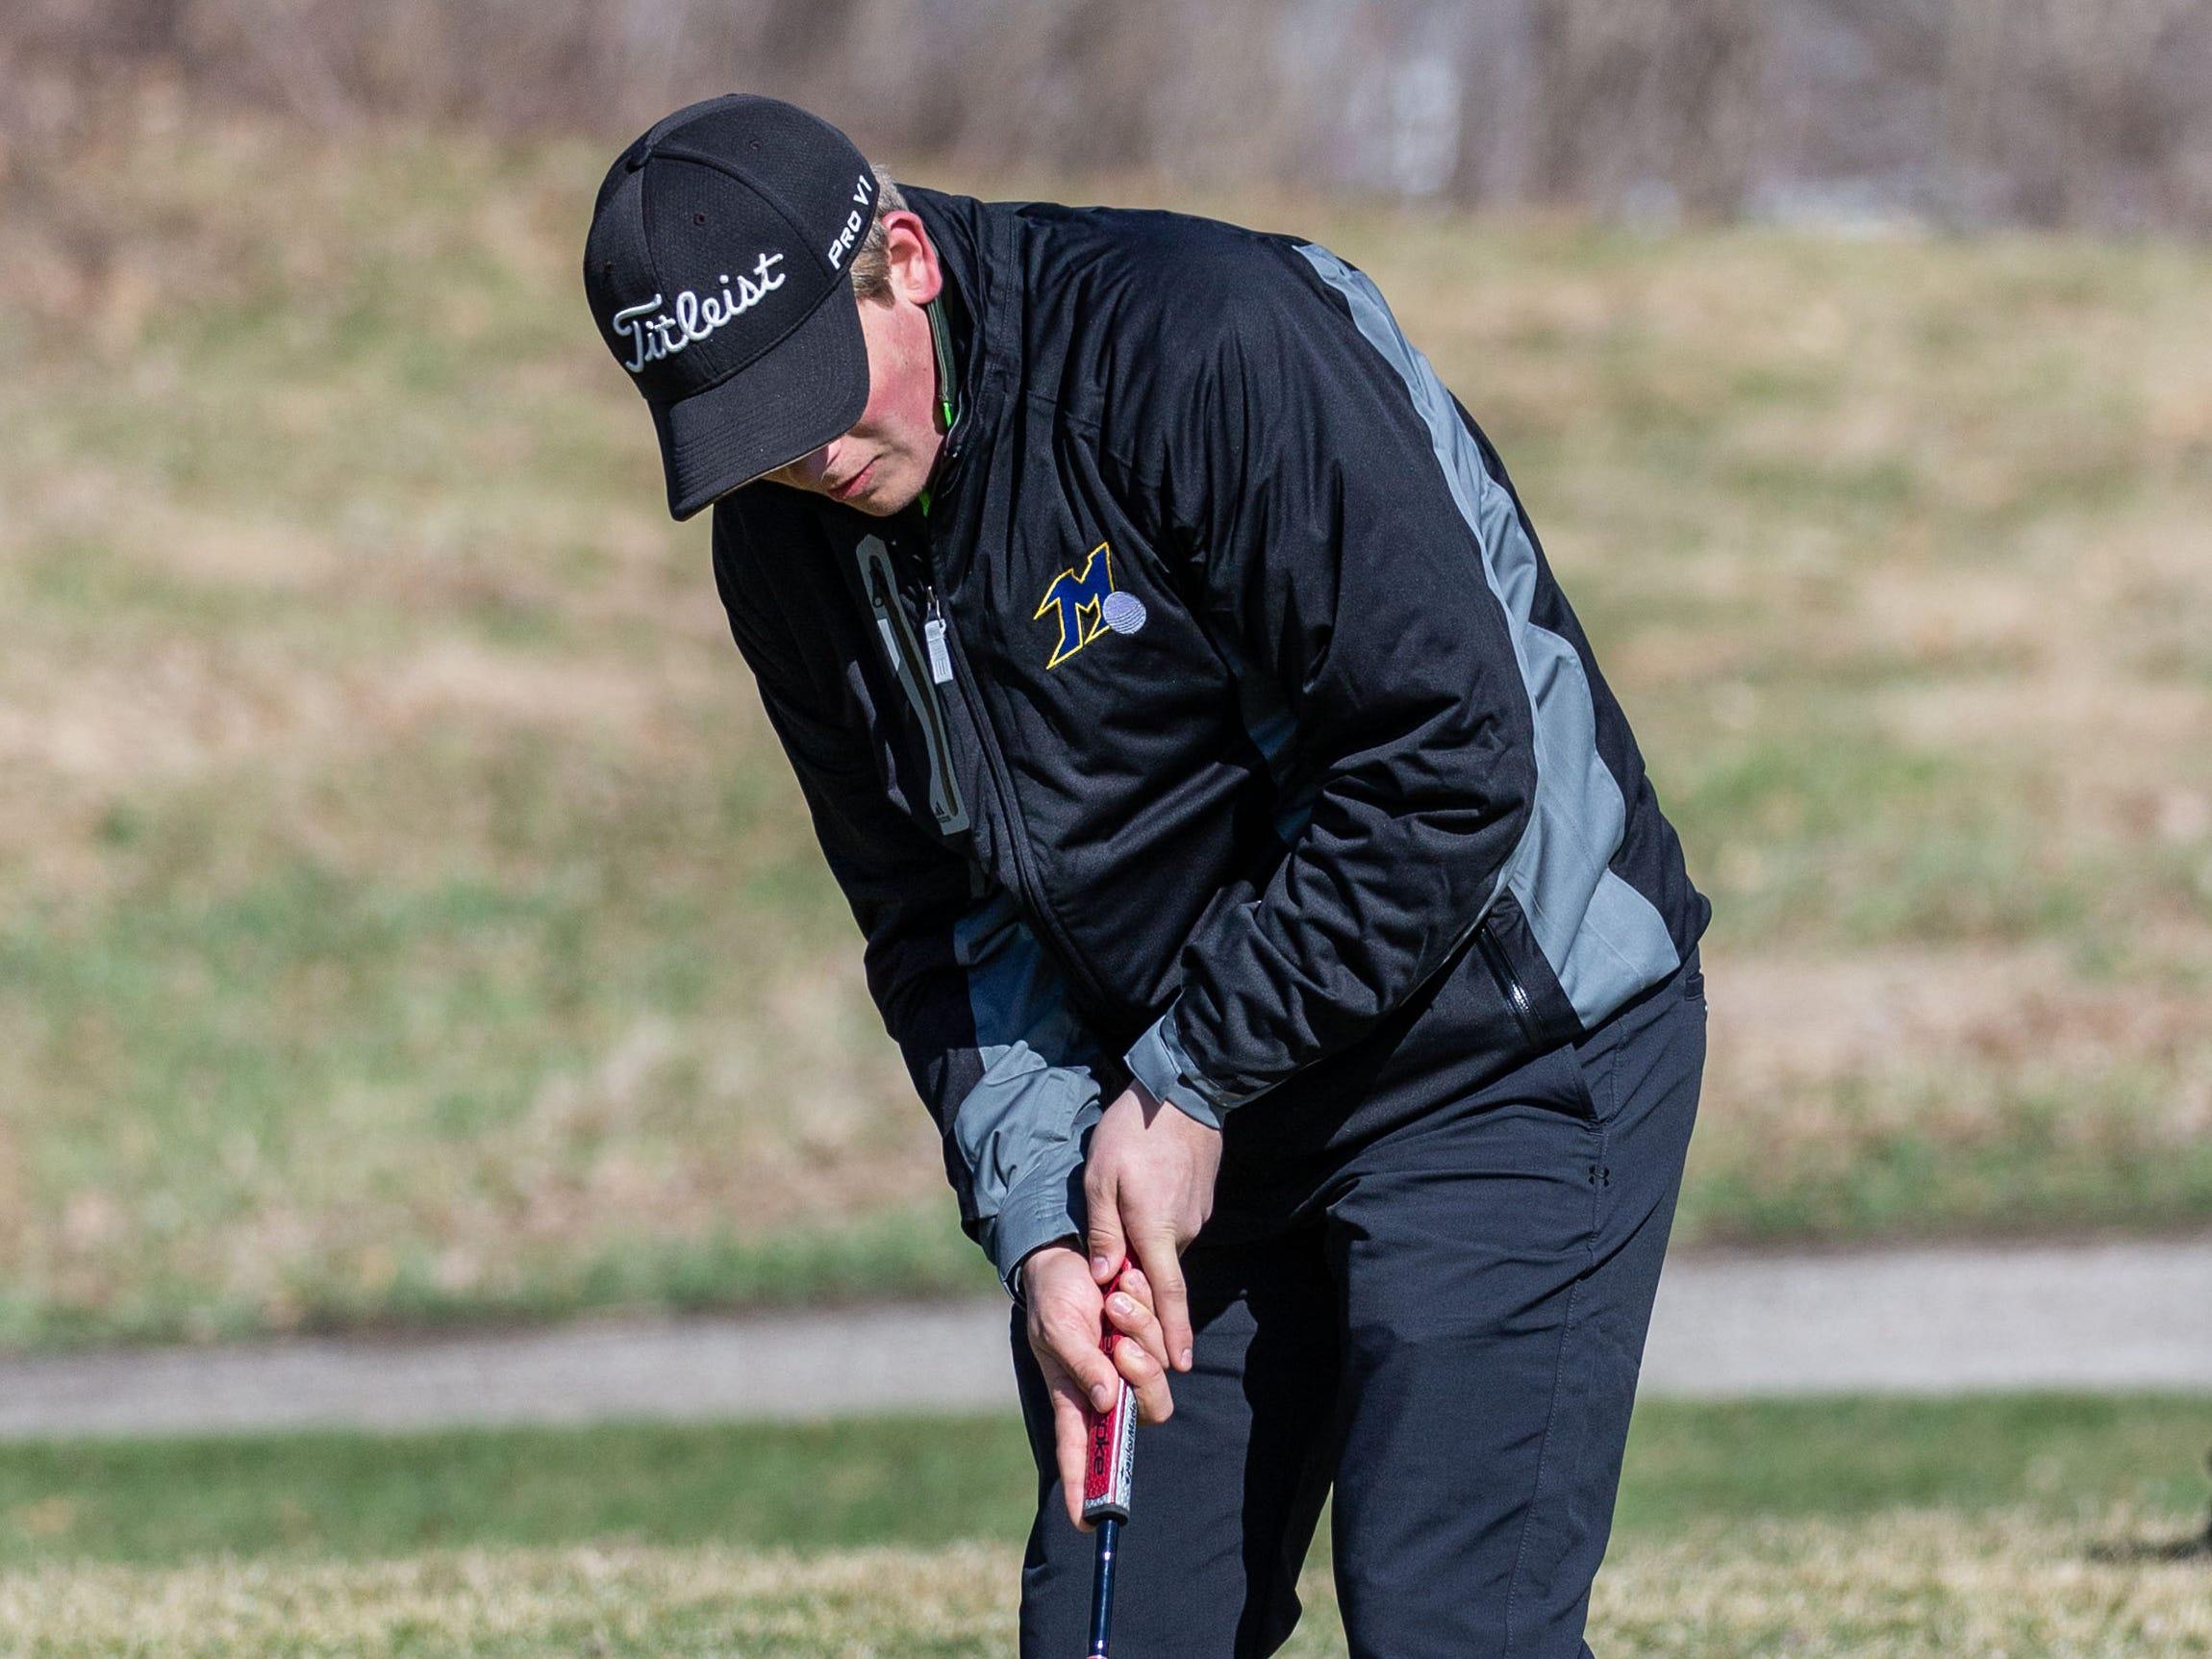 Mukwonago golfer Grant Fischer competes in the Catholic Memorial 2019 Crusader Invitational at Broadlands Golf Club in North Prairie on Saturday, April 13, 2019.